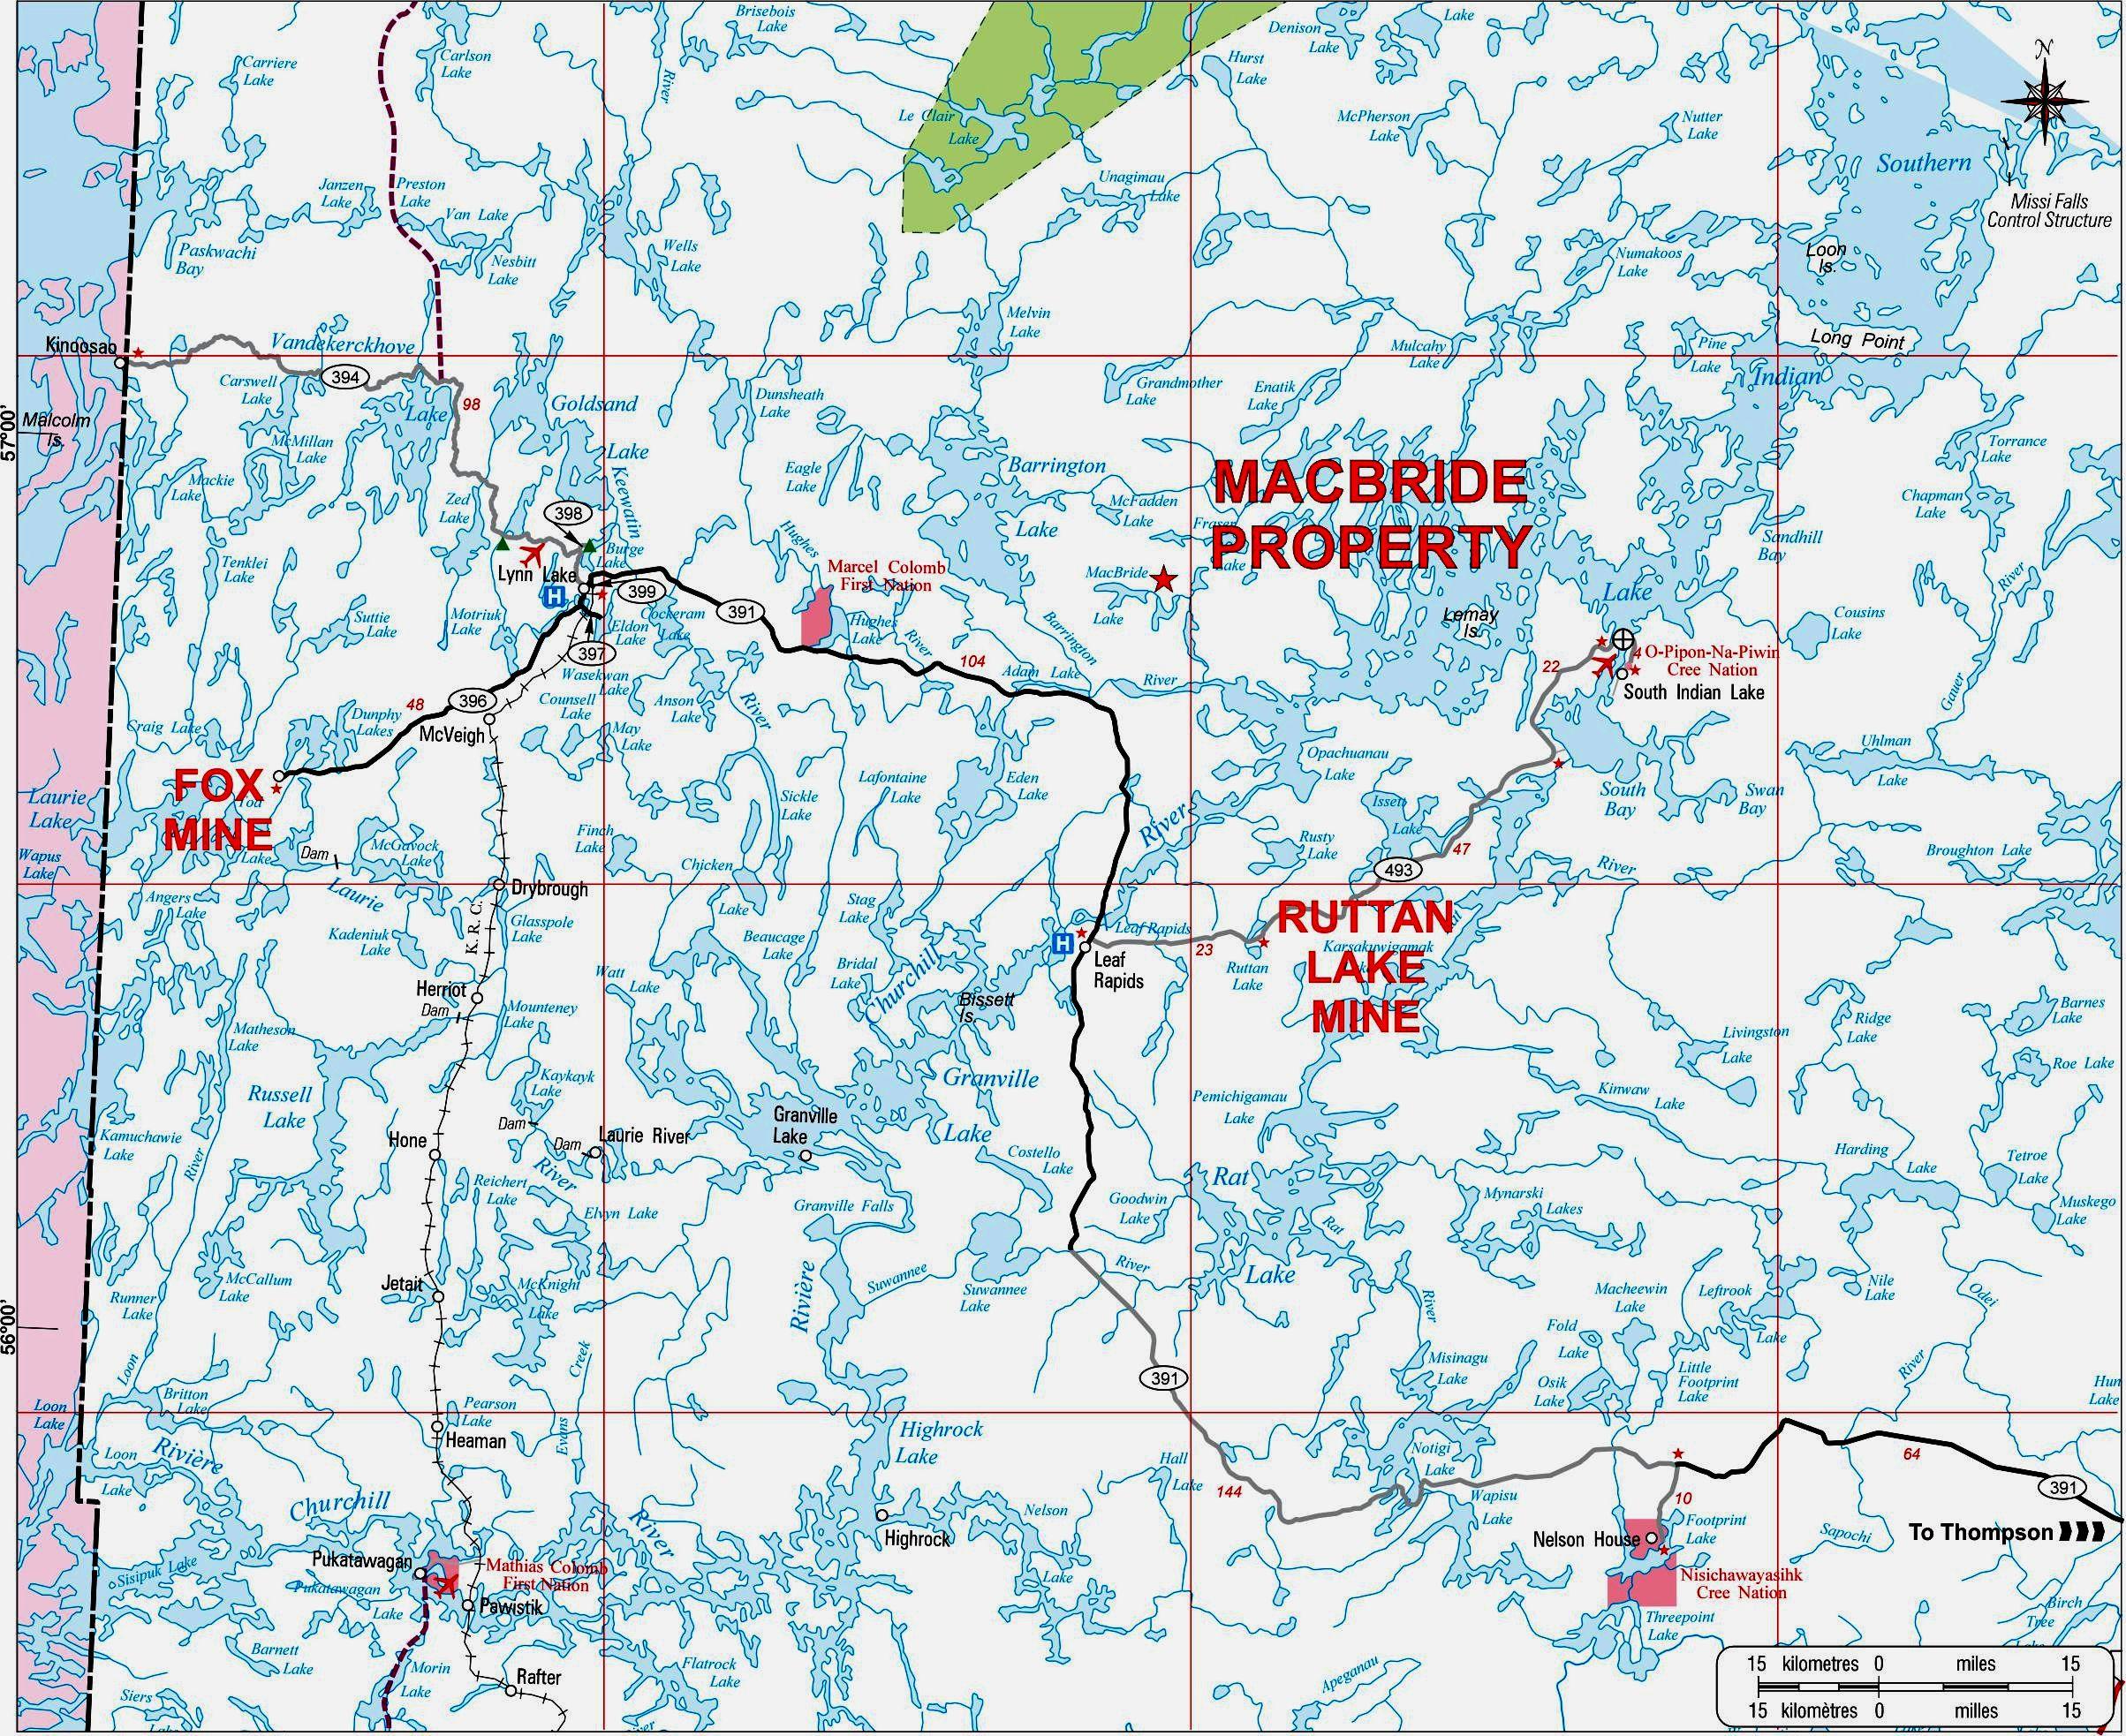 Fig 2.1 MacBride Location Map.jpg